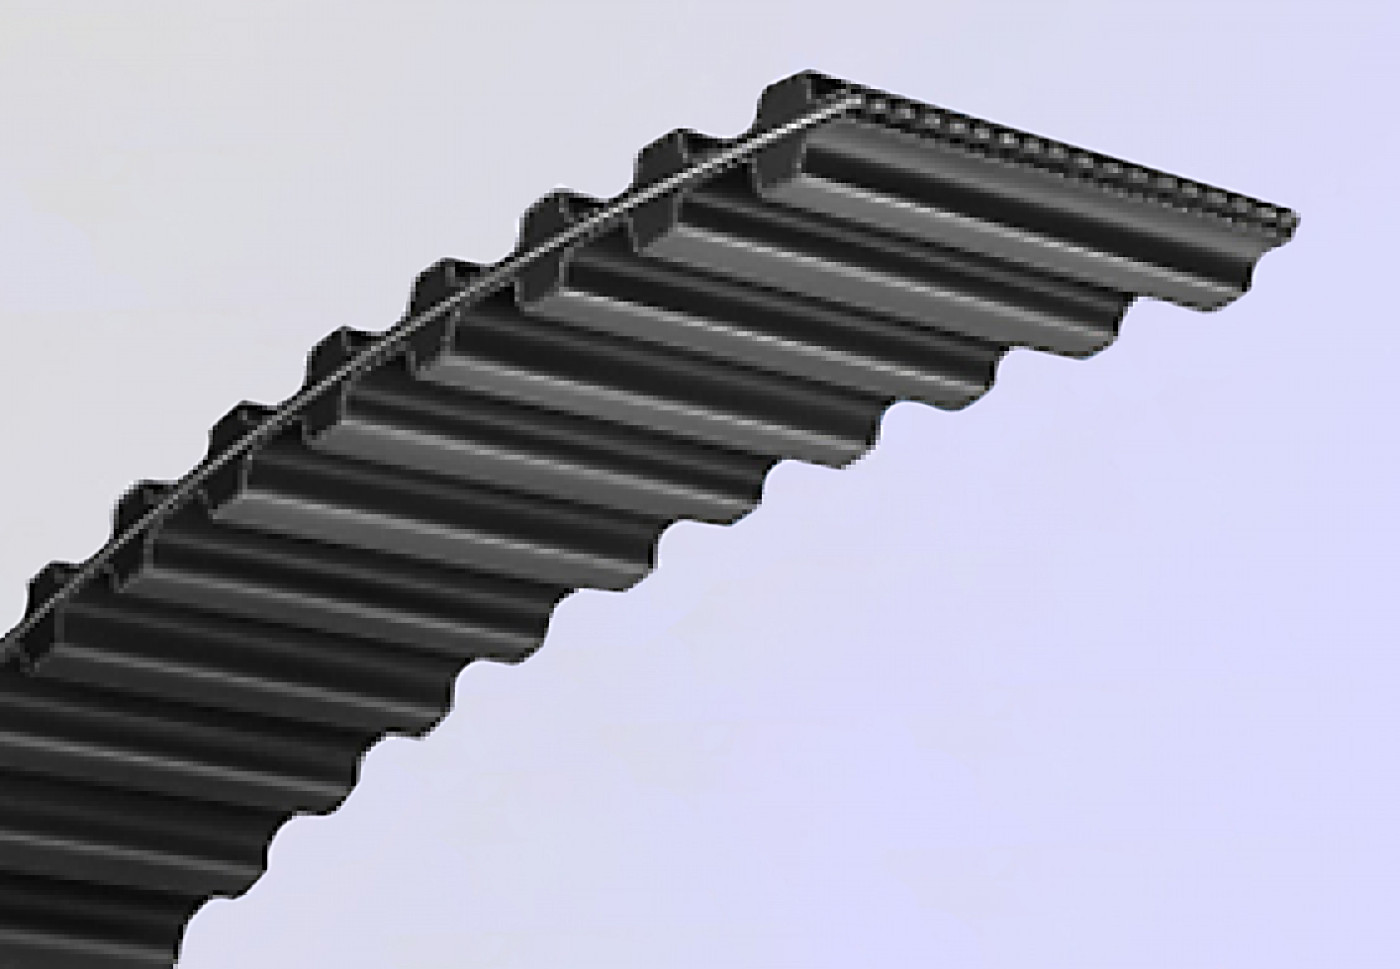 Klinový remeň Dĺžka: 1800 mm John Deere LT133 LT155 LT166